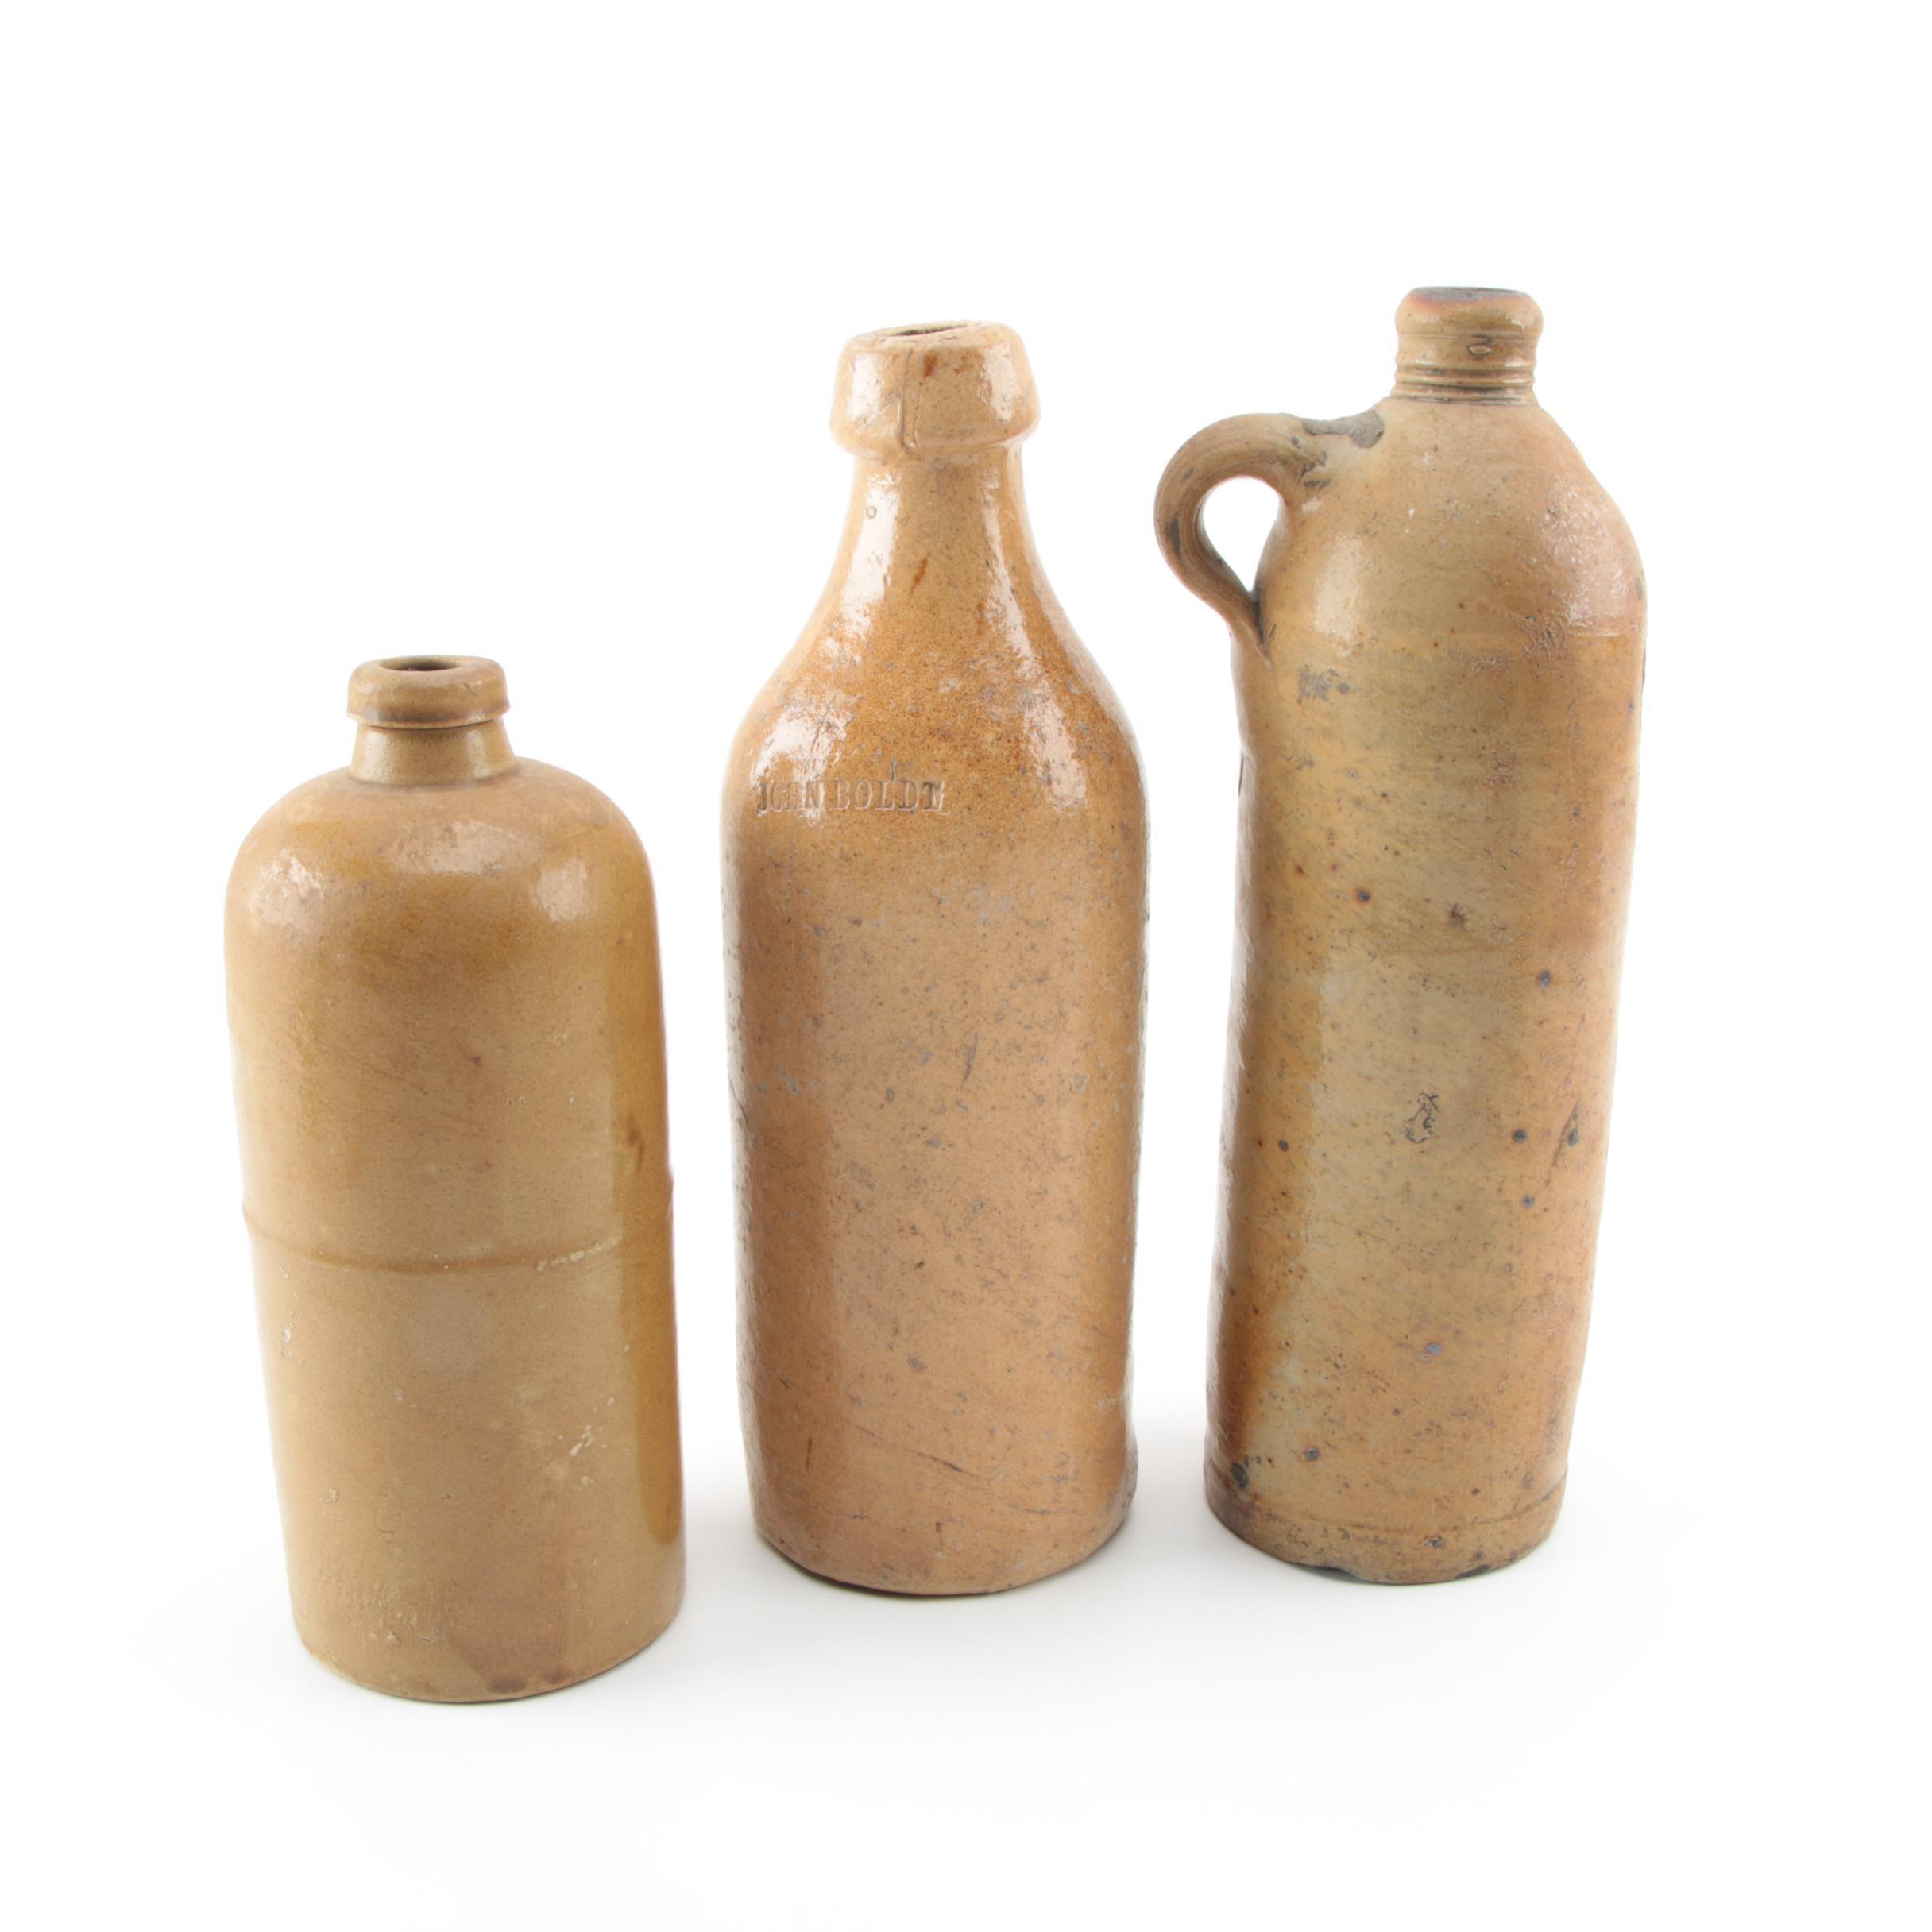 John Boldt and Other Antique Stoneware Whiskey Bottles